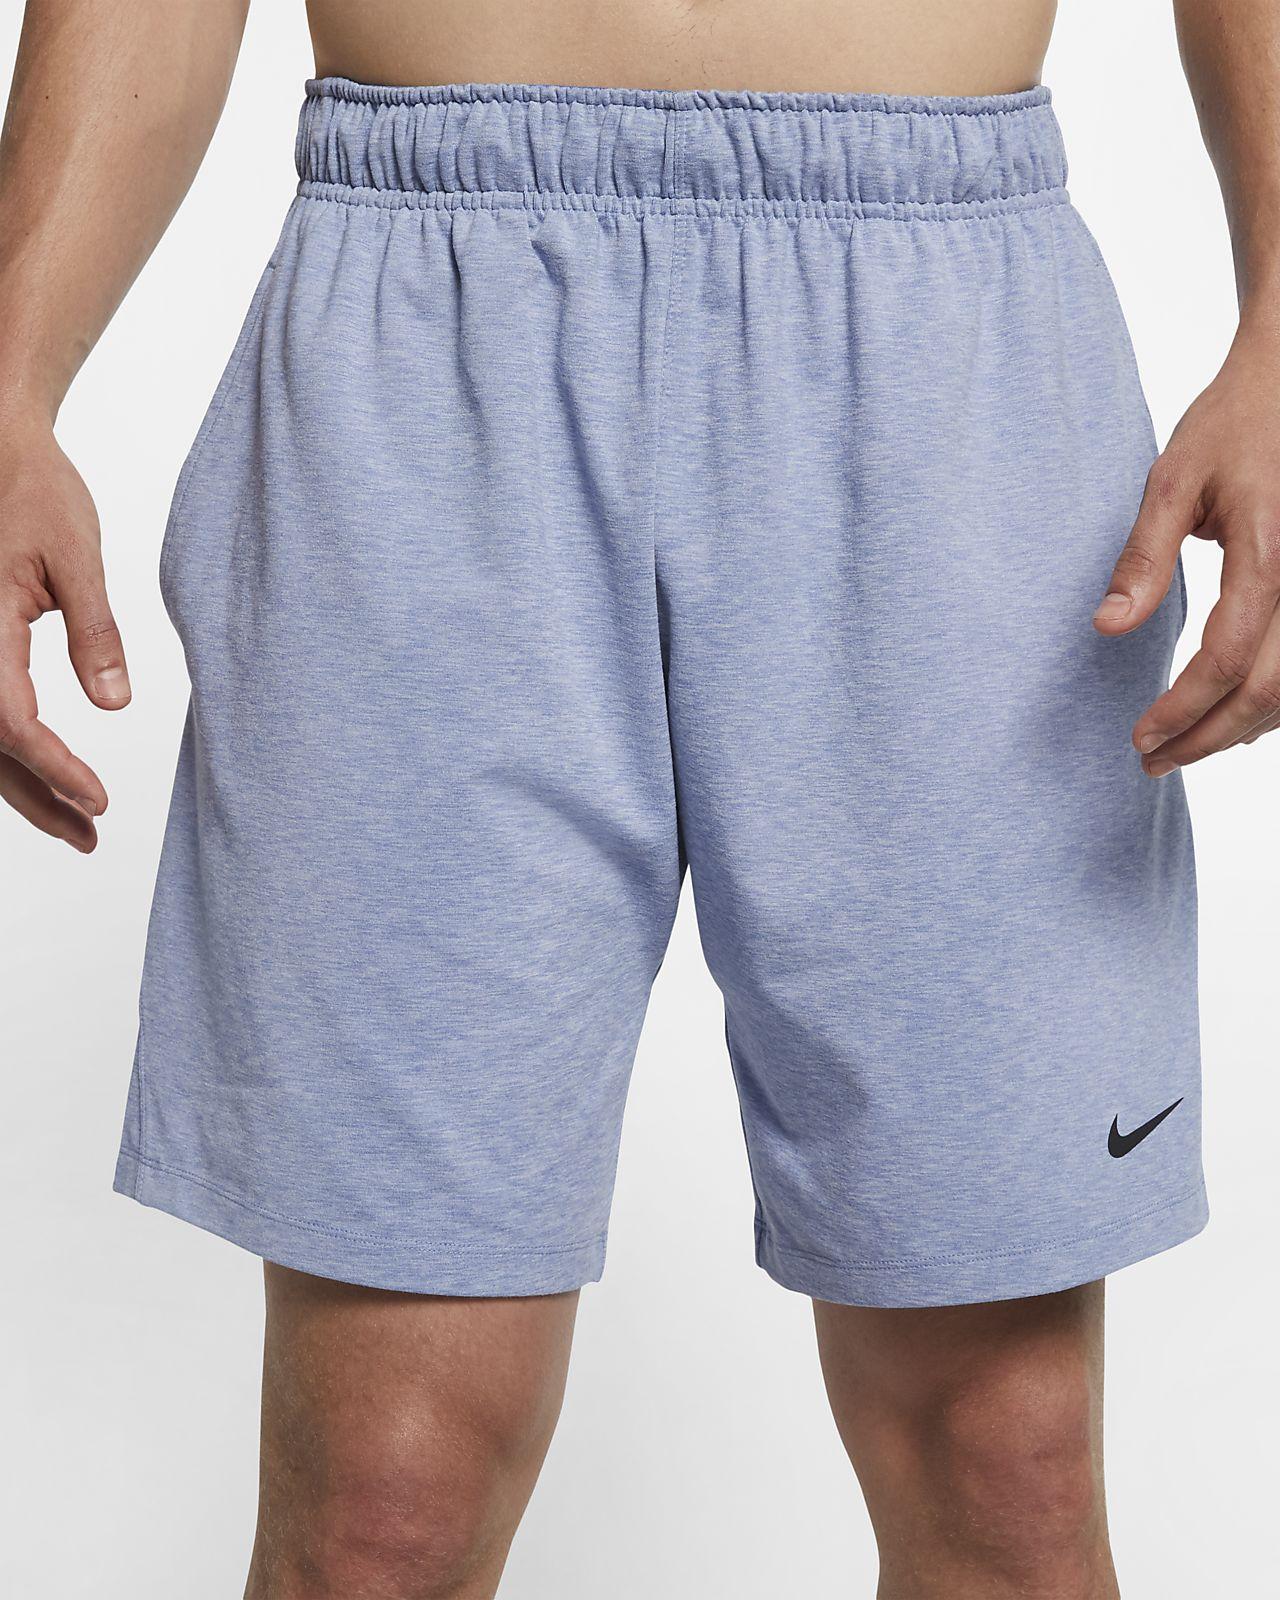 Fit Nike Entrenamiento Dri Hombre Pantalón Pqh7ff Corto Yoga De xSYq5Bw